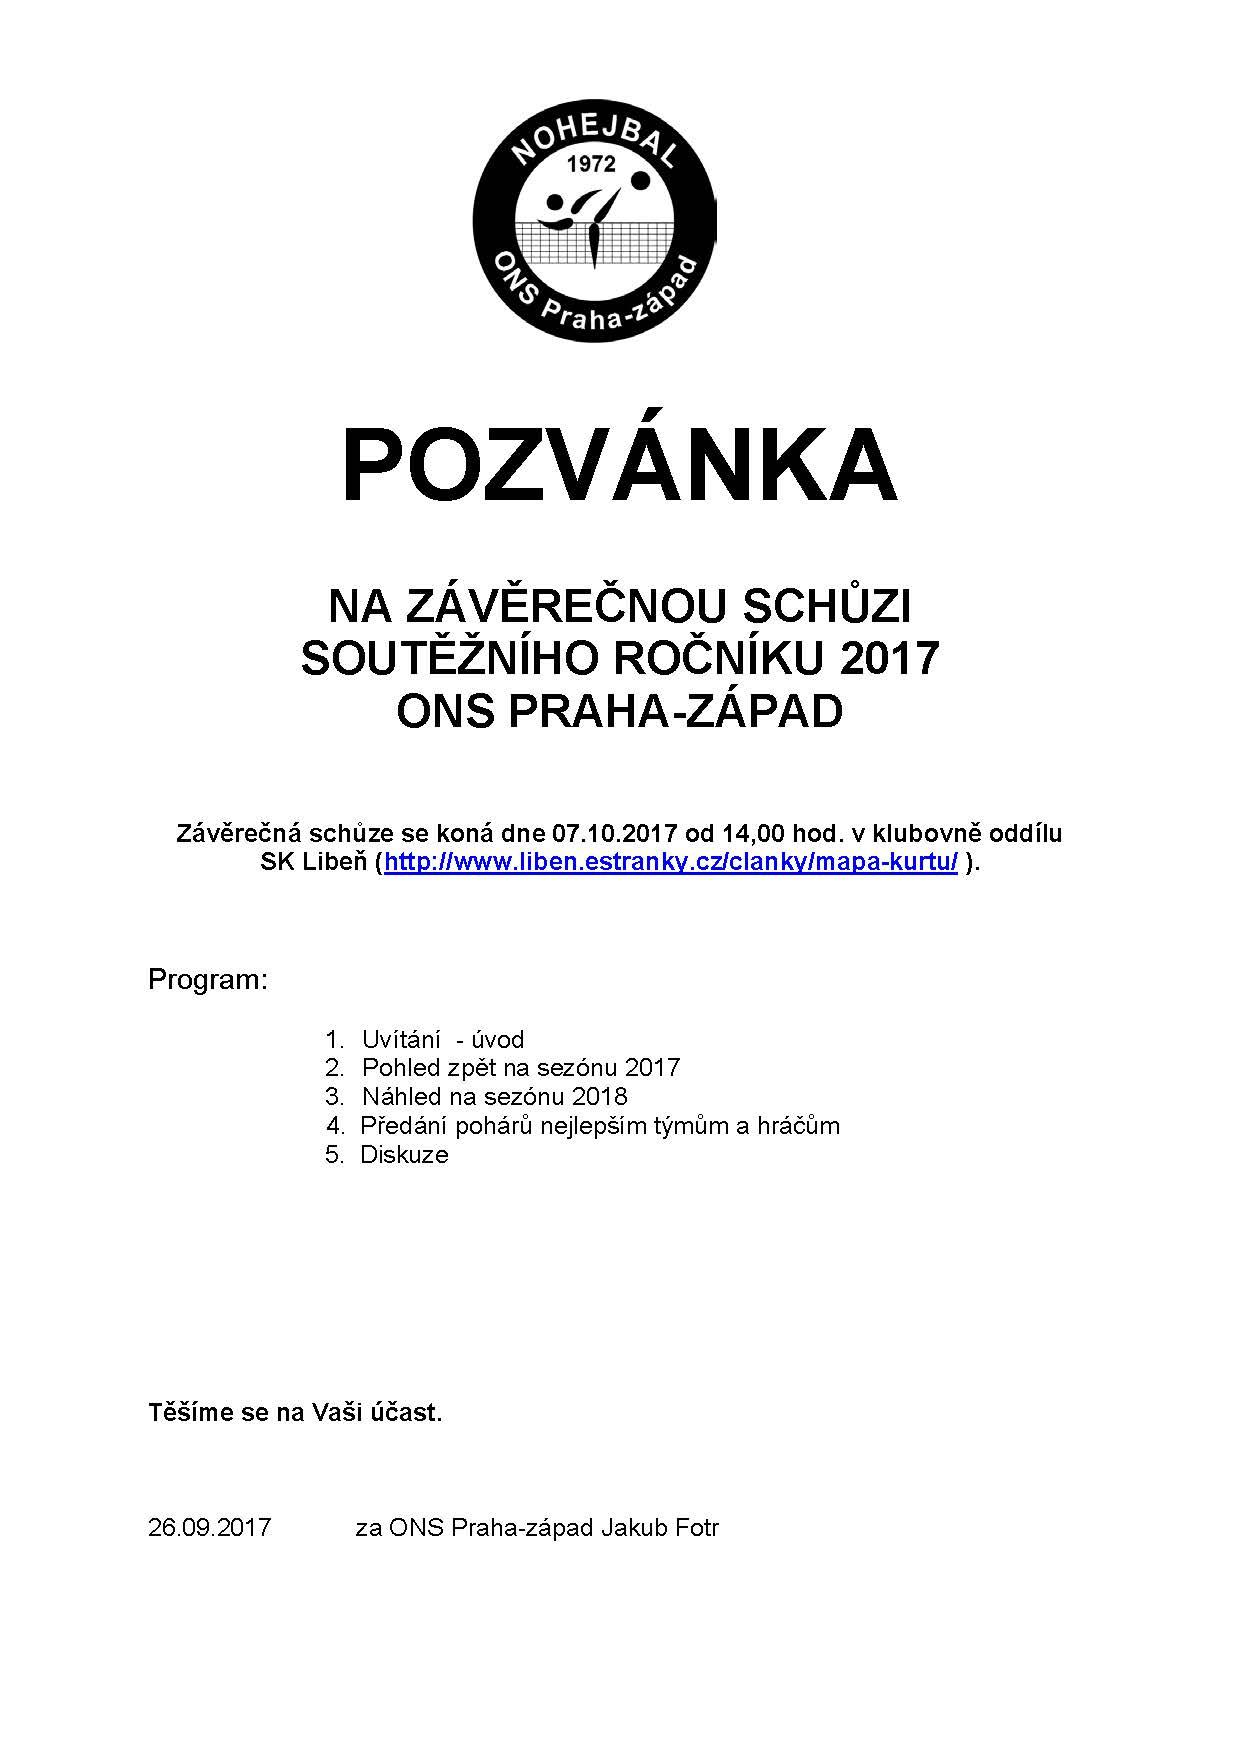 pozvanka-zakonceni-2017.jpg